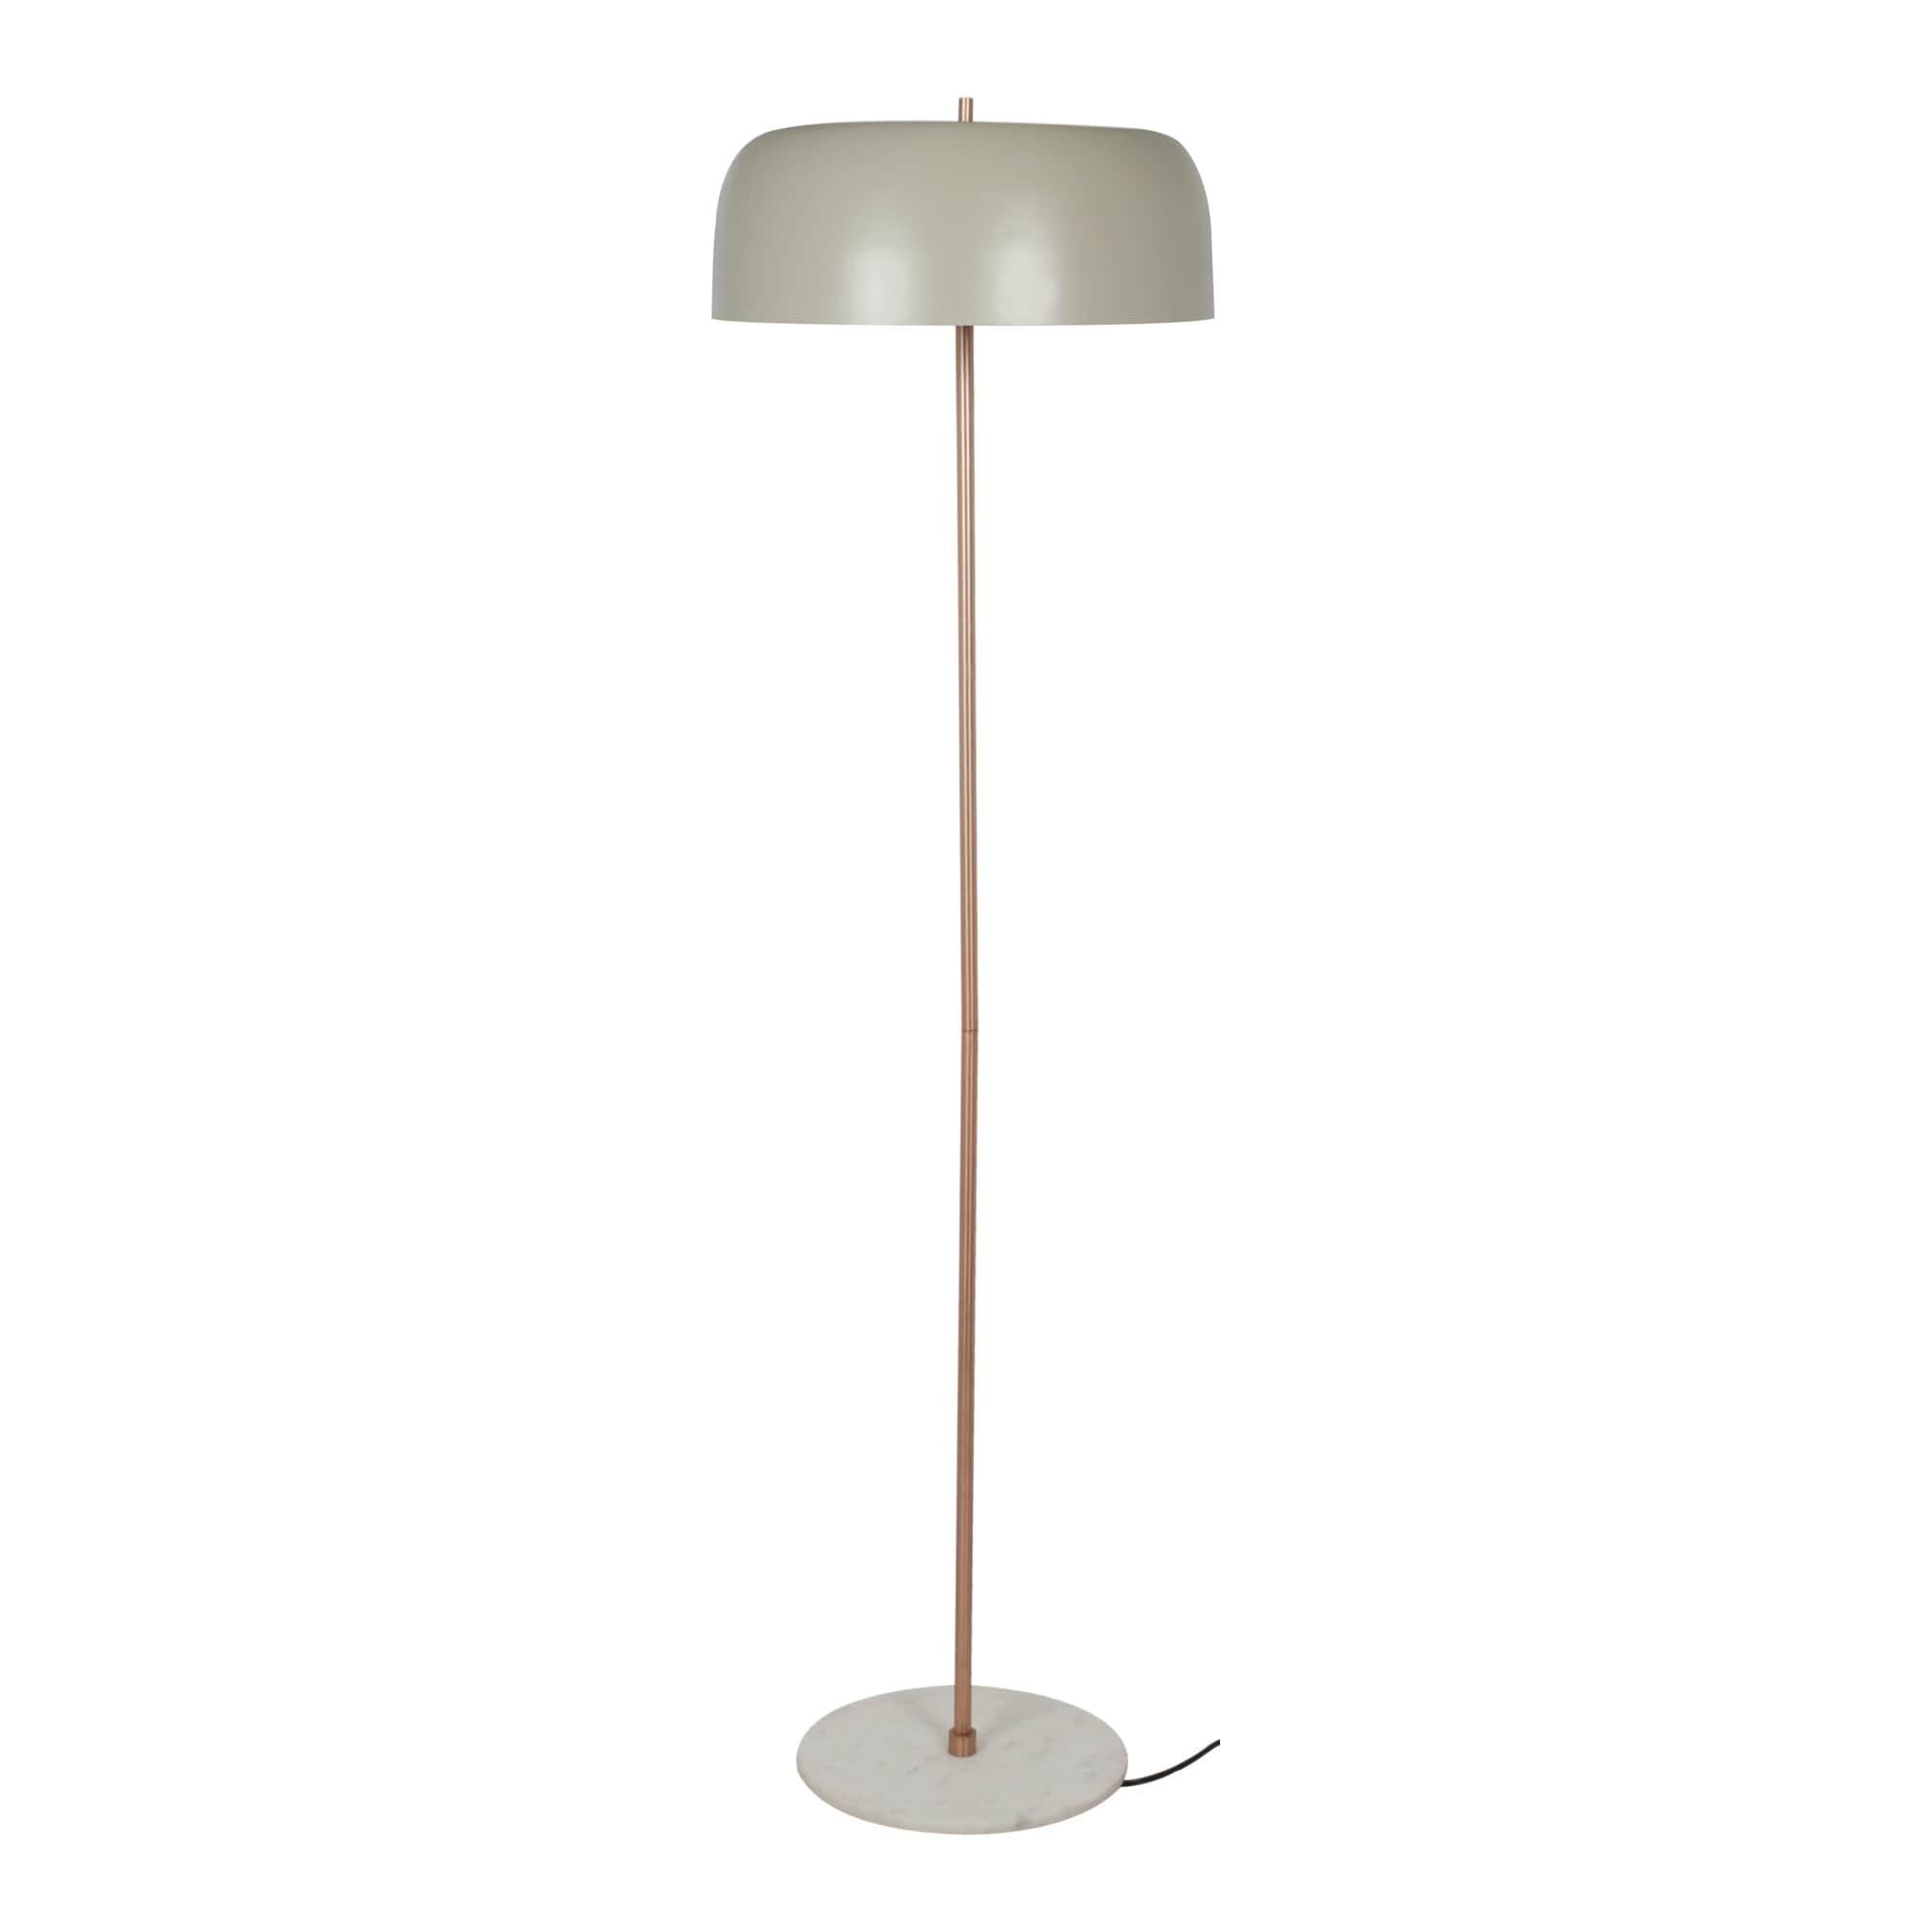 Shop Black Friday Deals On Aurelle Home Gillian Marble Base Mid Century Modern Floor Lamp Overstock 24121266